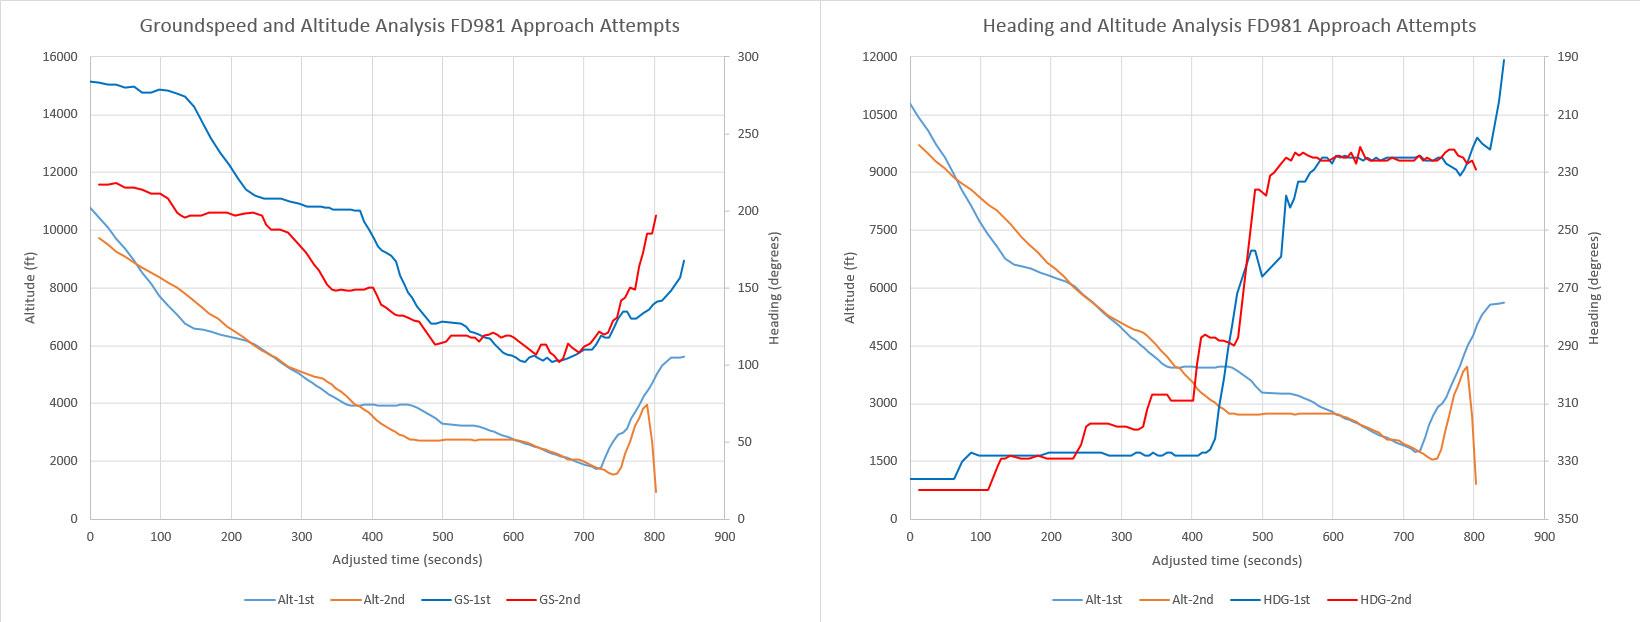 ADS-B Analysis of FlyDubai 981: A Case of Somatogravic Illusion?